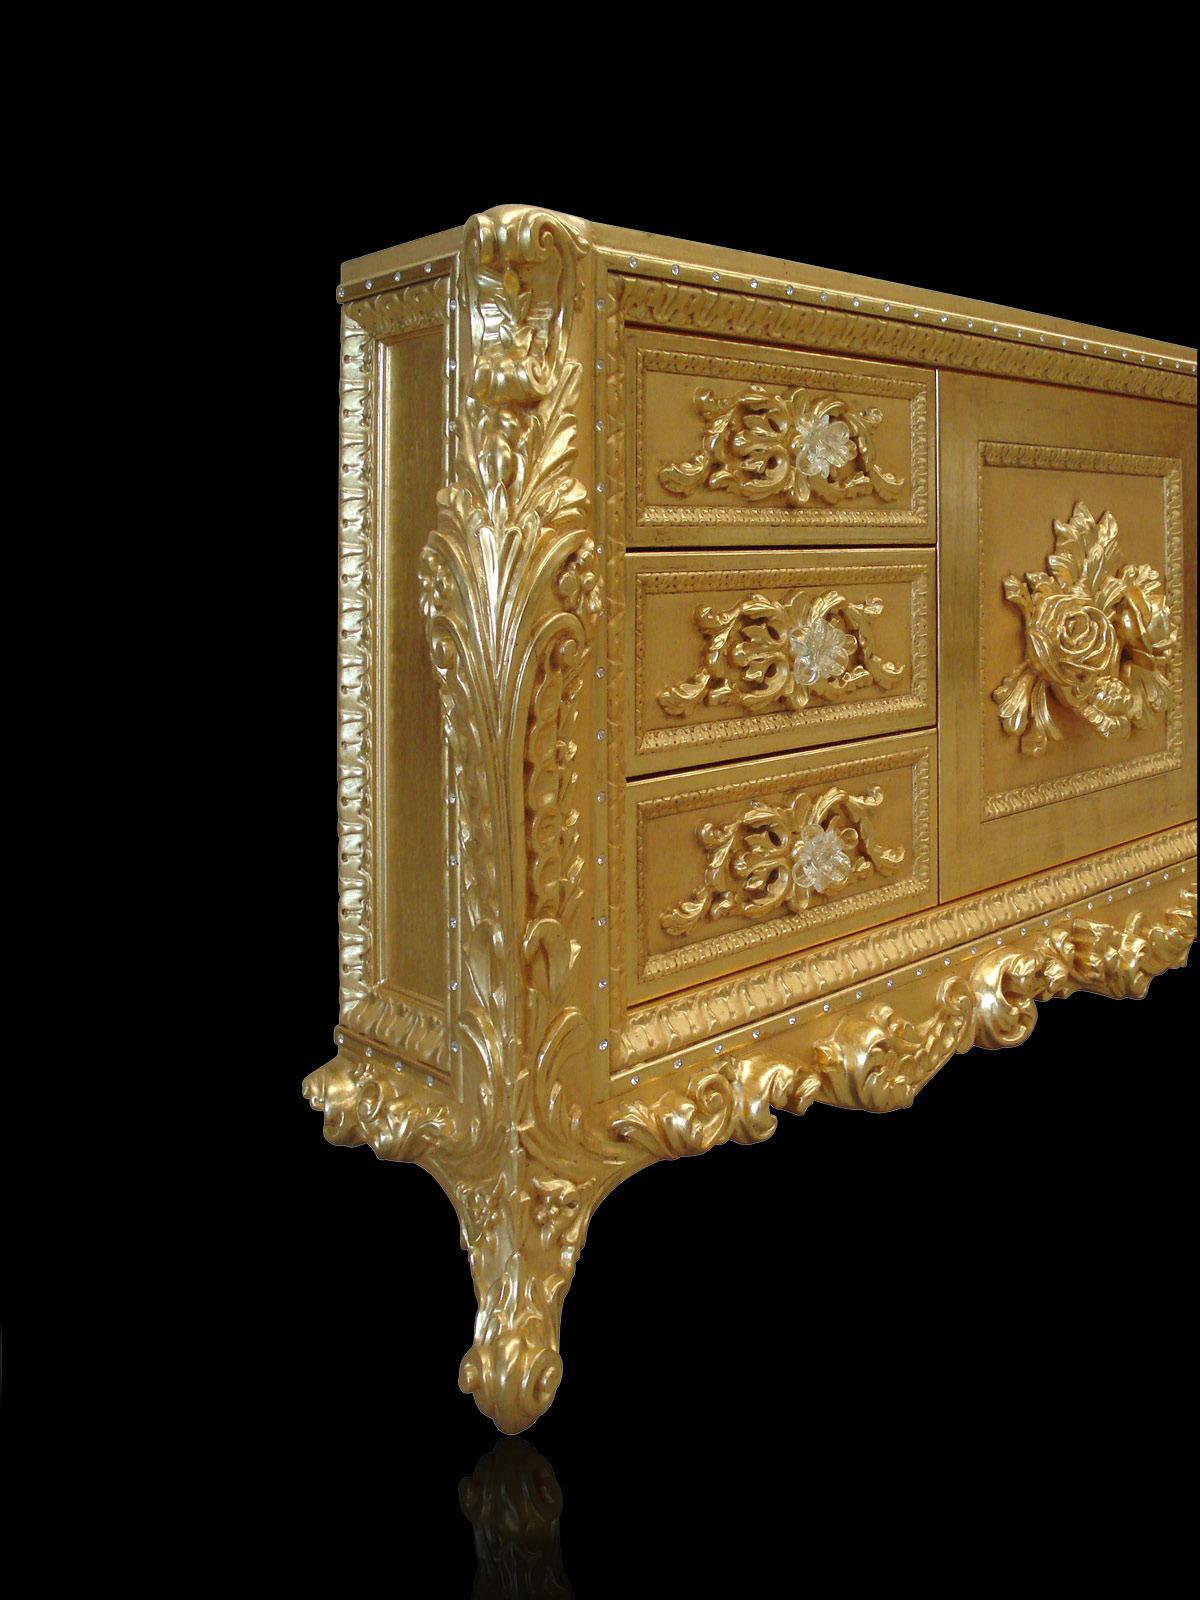 Custom vanities finished in gold leaf 24K